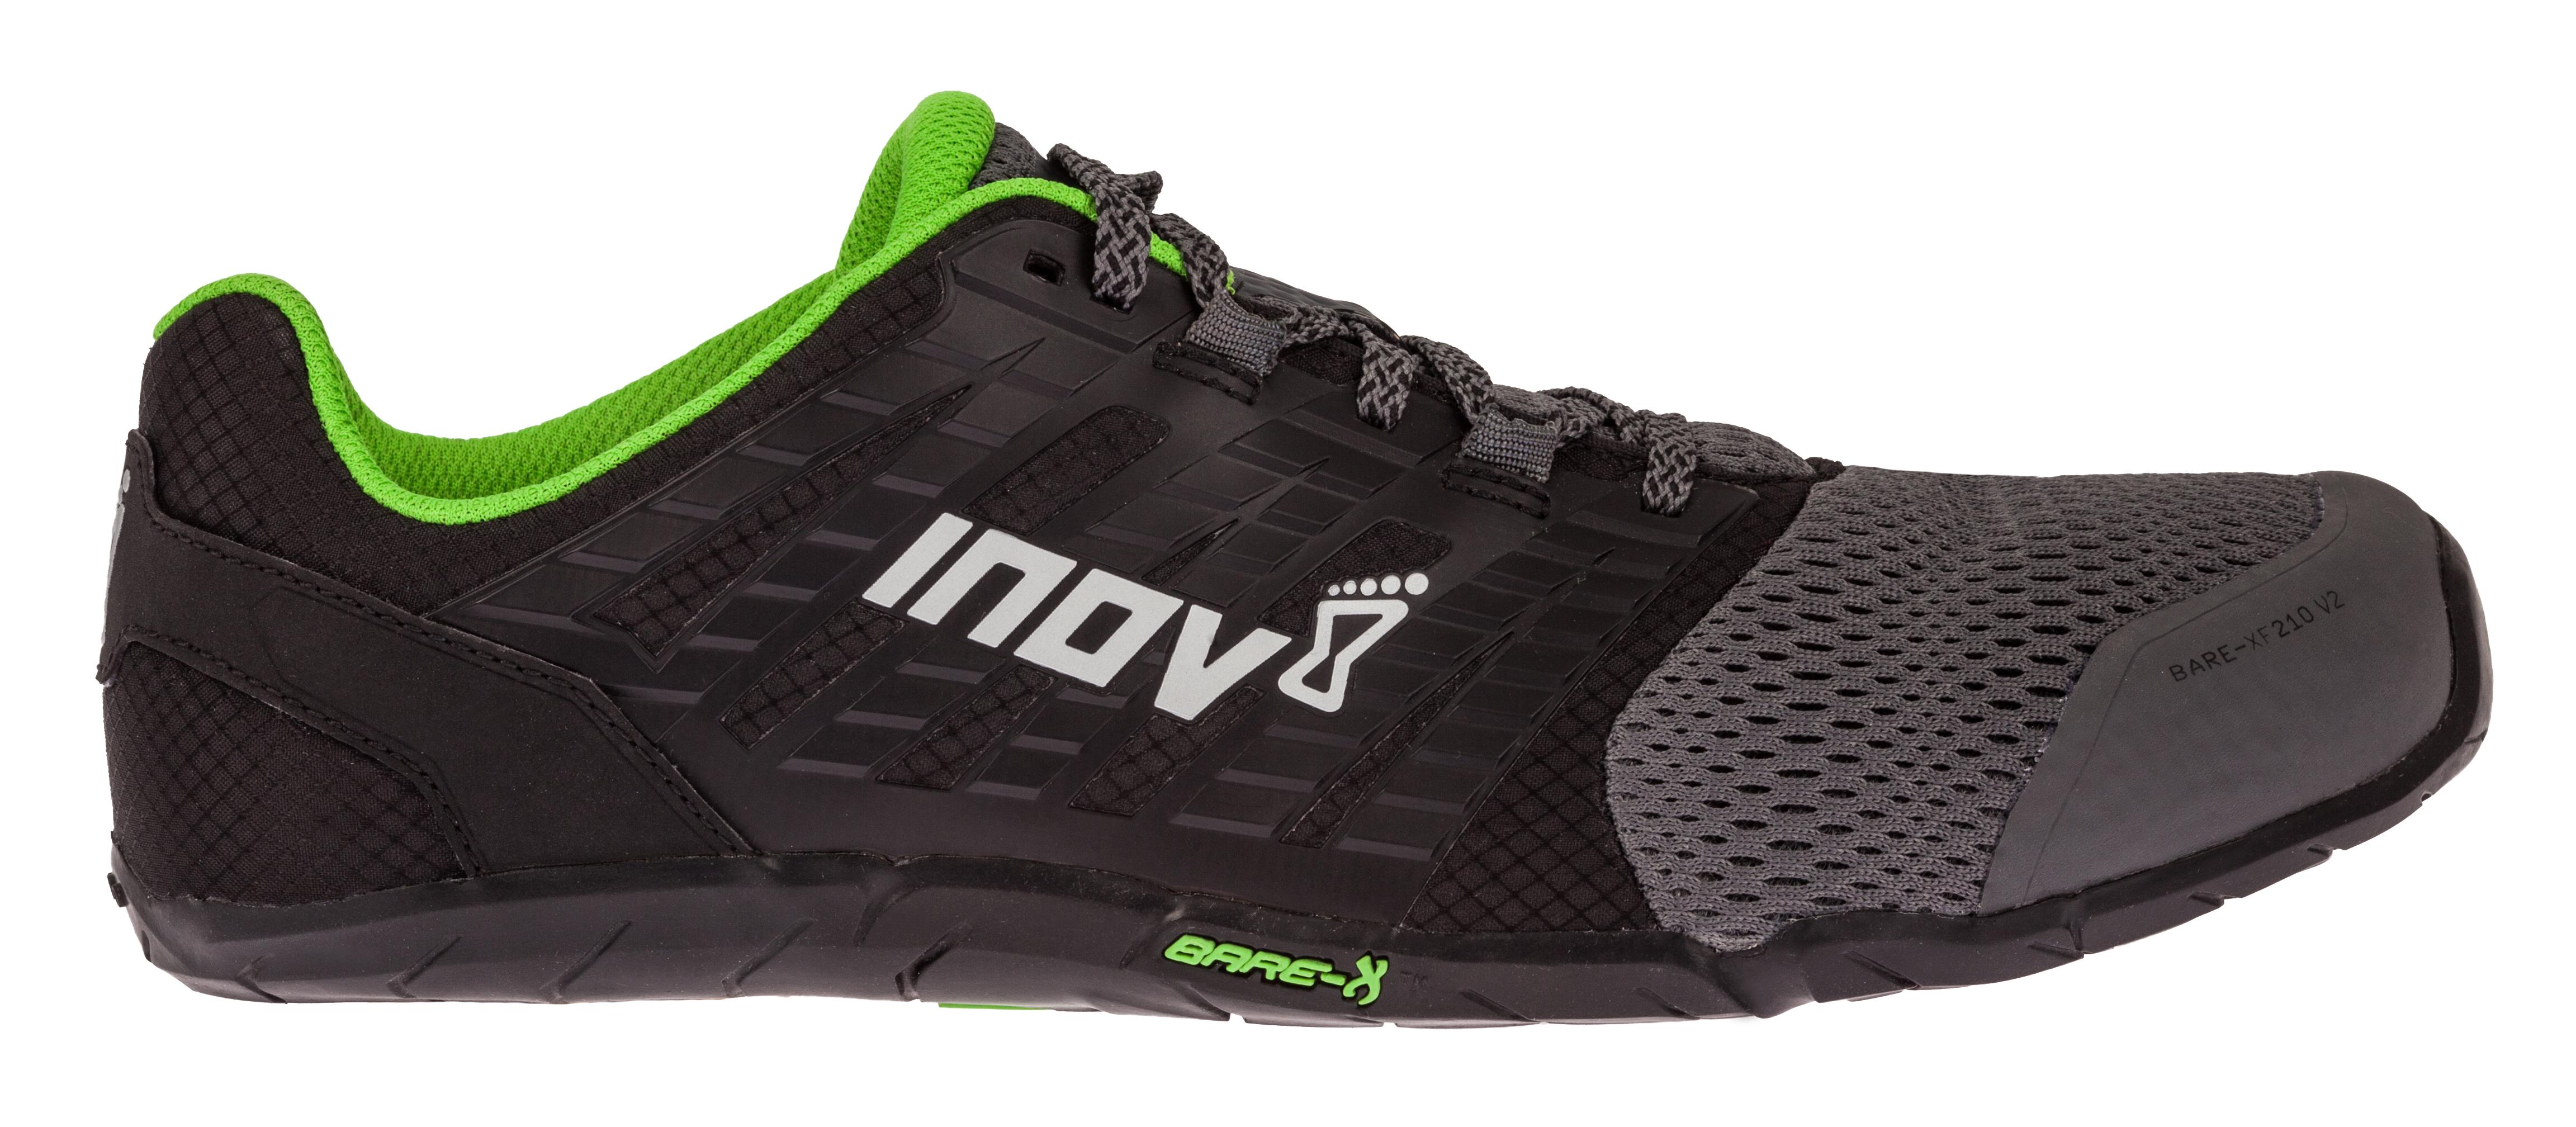 Inov-8 Bare XF 210 V2 Fitness Schoenen Heren - Grijs / Zwart / Groen - 10.5 thumbnail